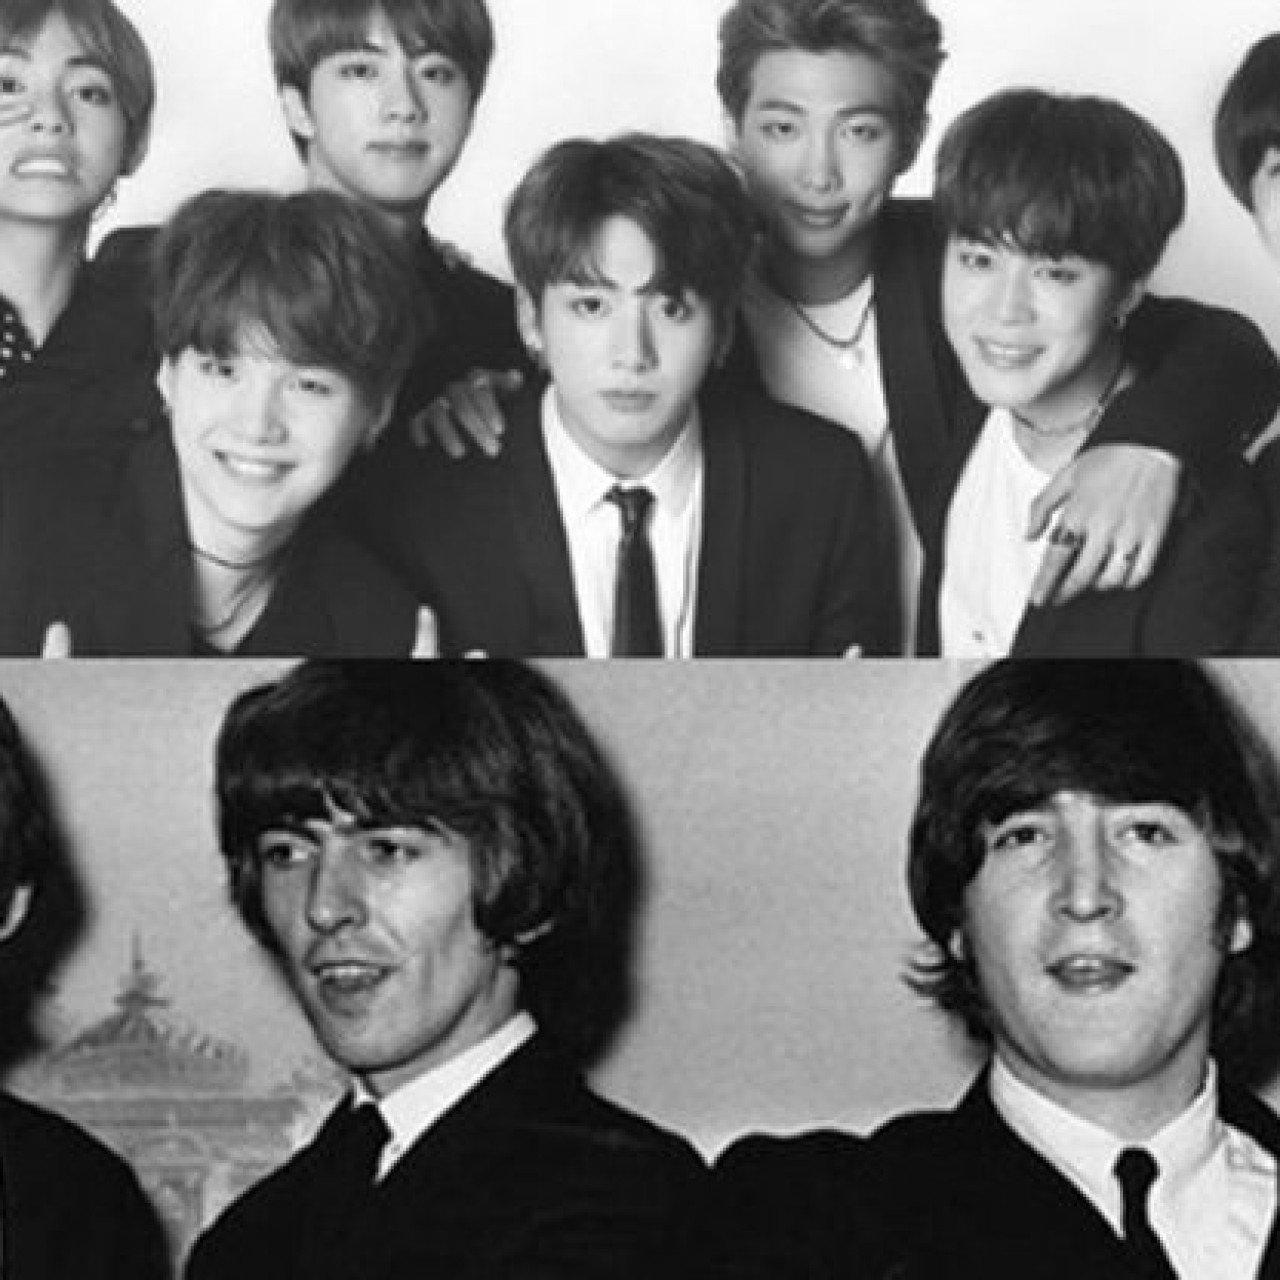 Bigger than The Beatles? BTS celebrates 3 Billboard No 1